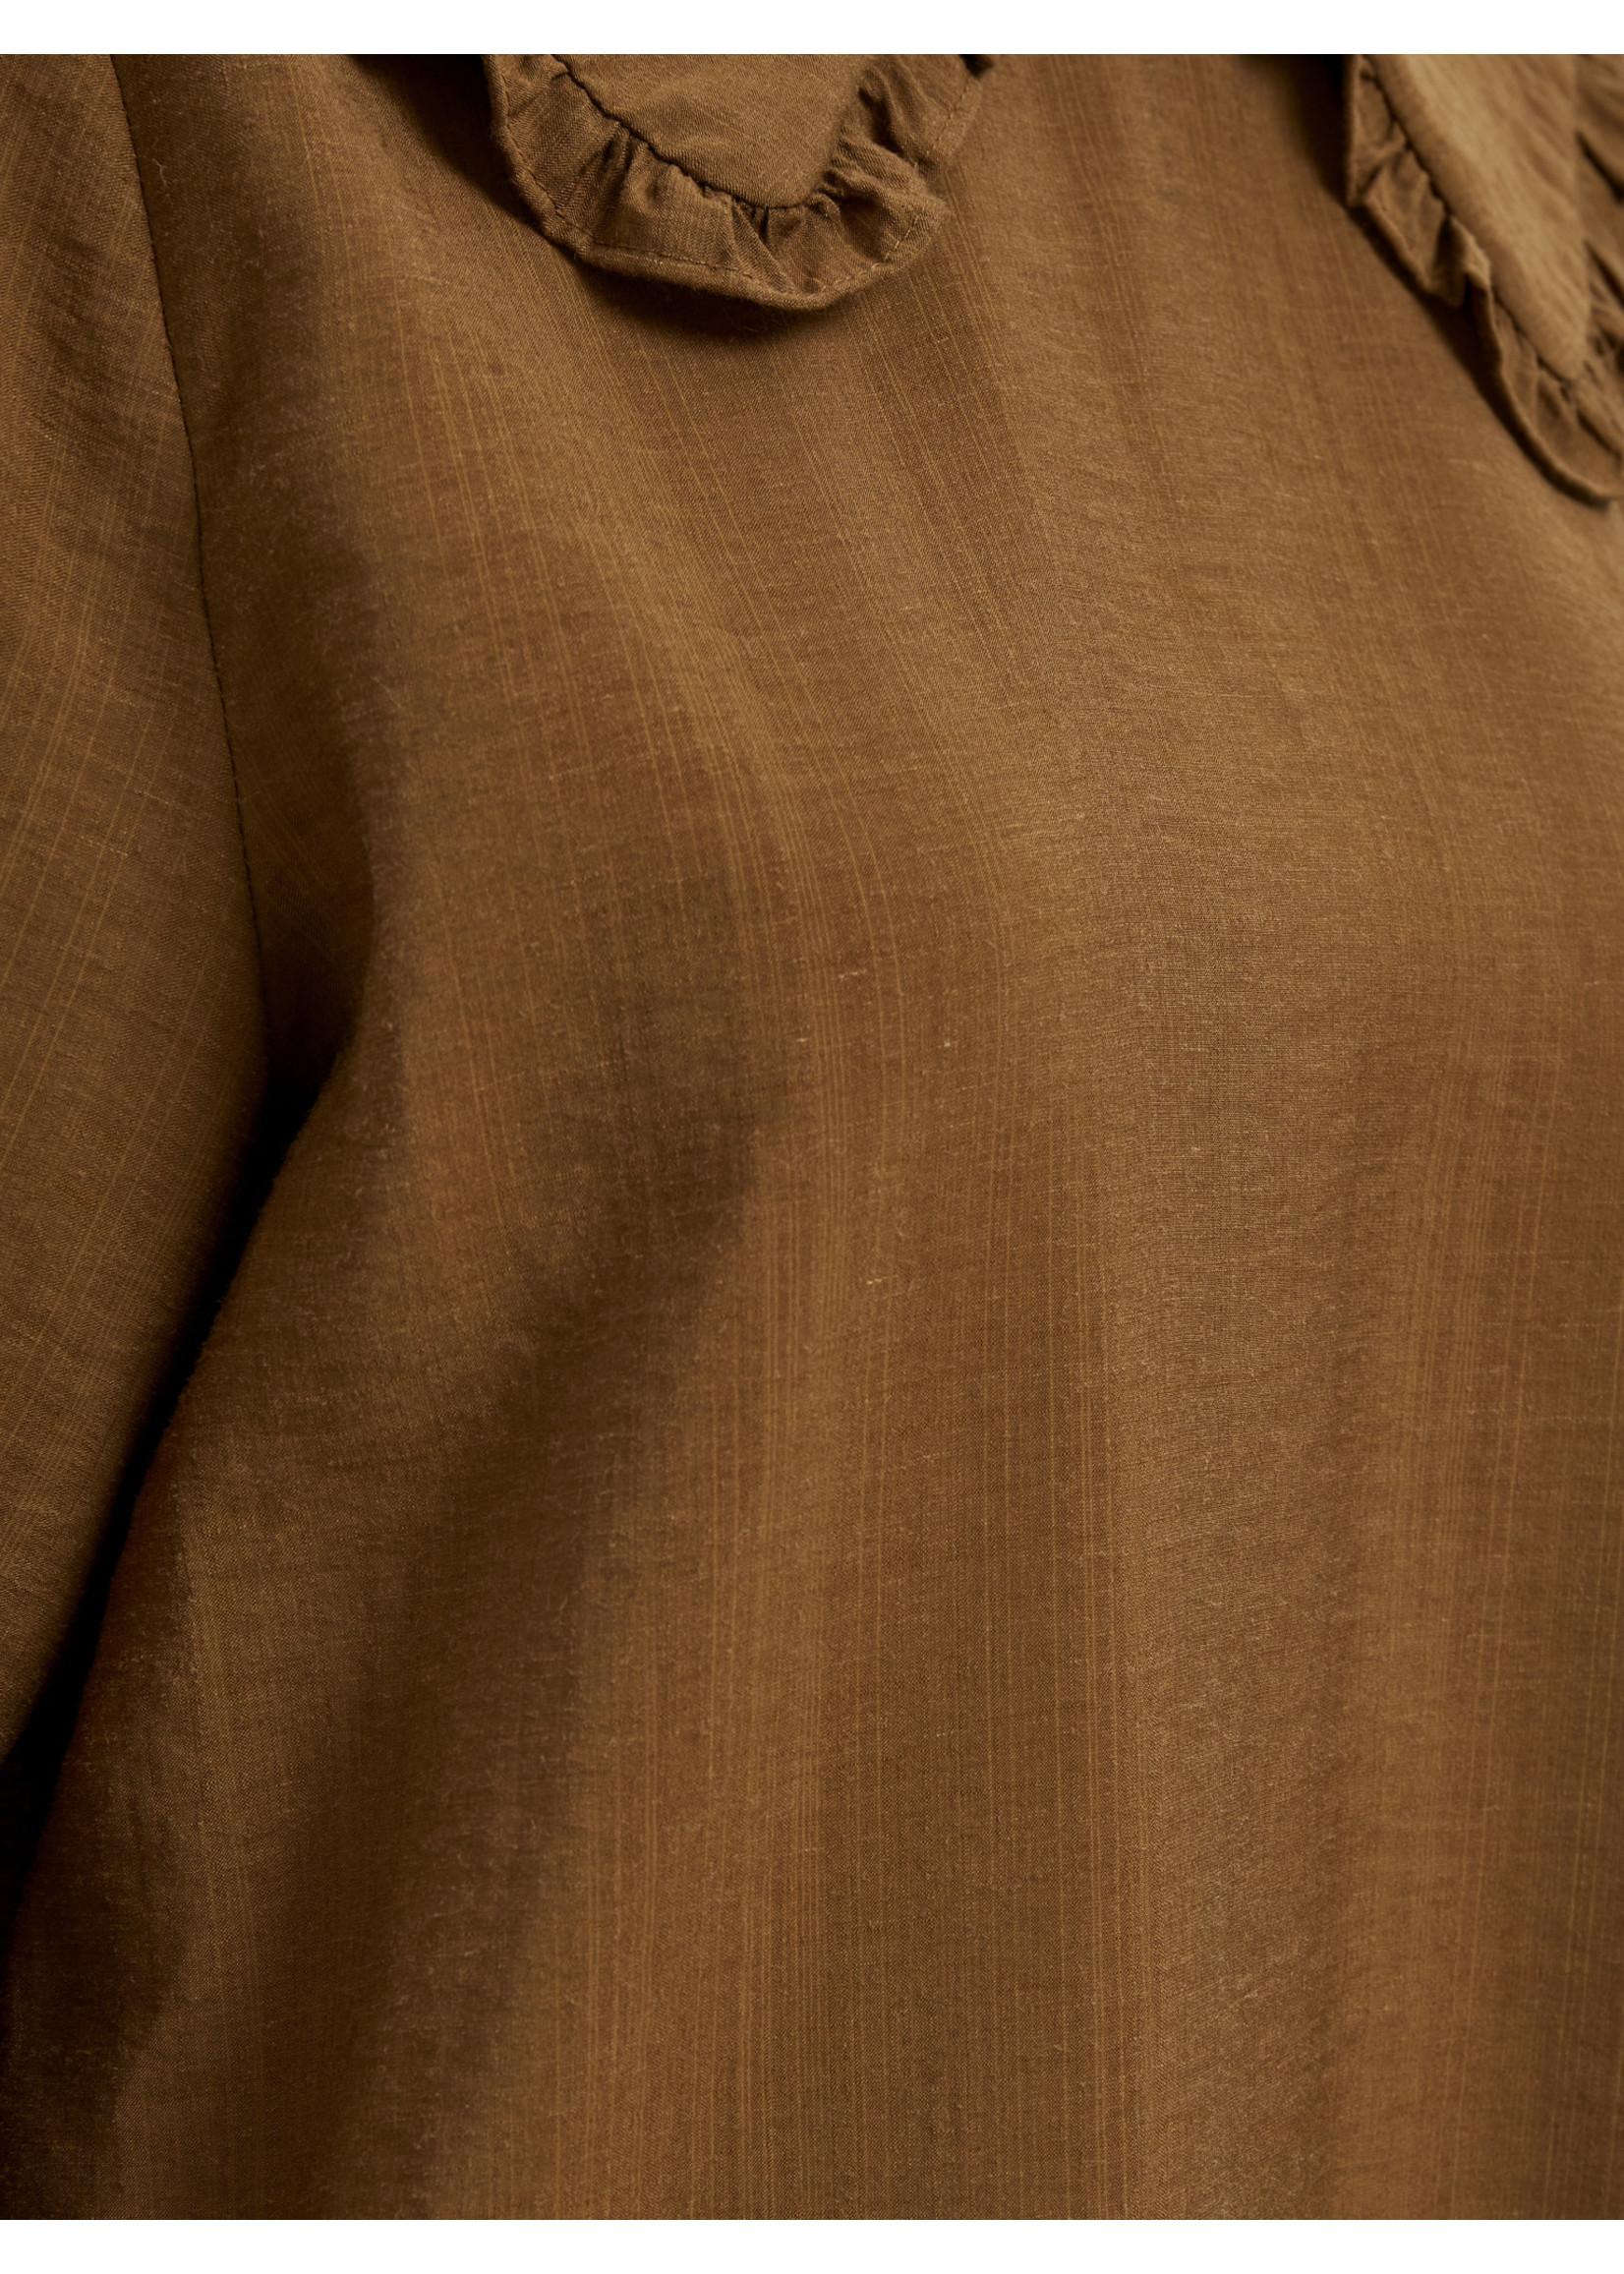 PEPPERCORN JOSEPHINE BLOUSE monk's robe pr